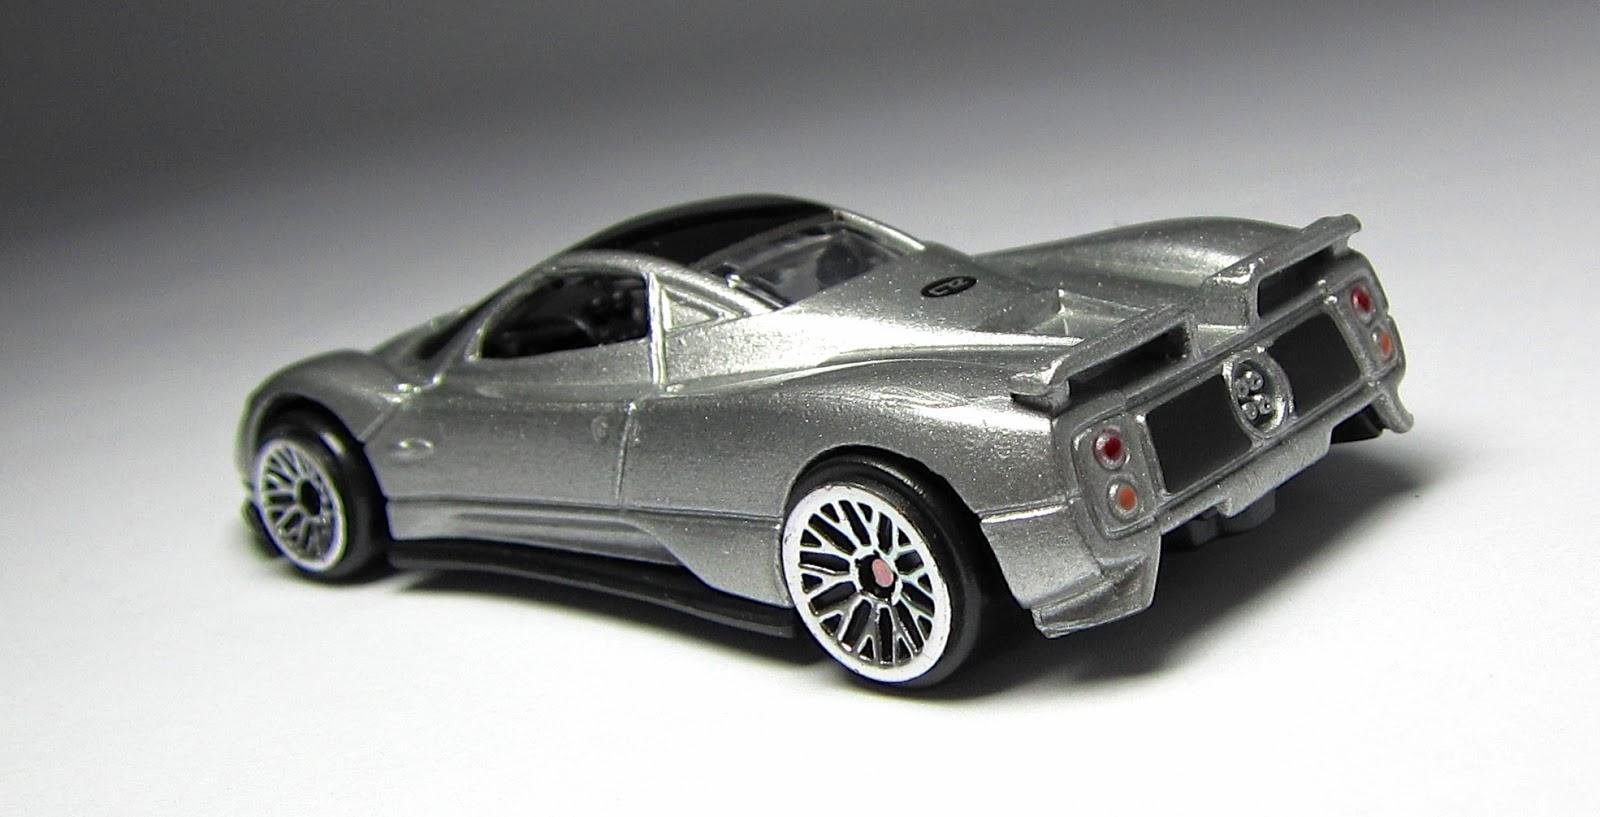 Model of the Day: Motor Max Pagani Zonda C12… – theLamleyGroup